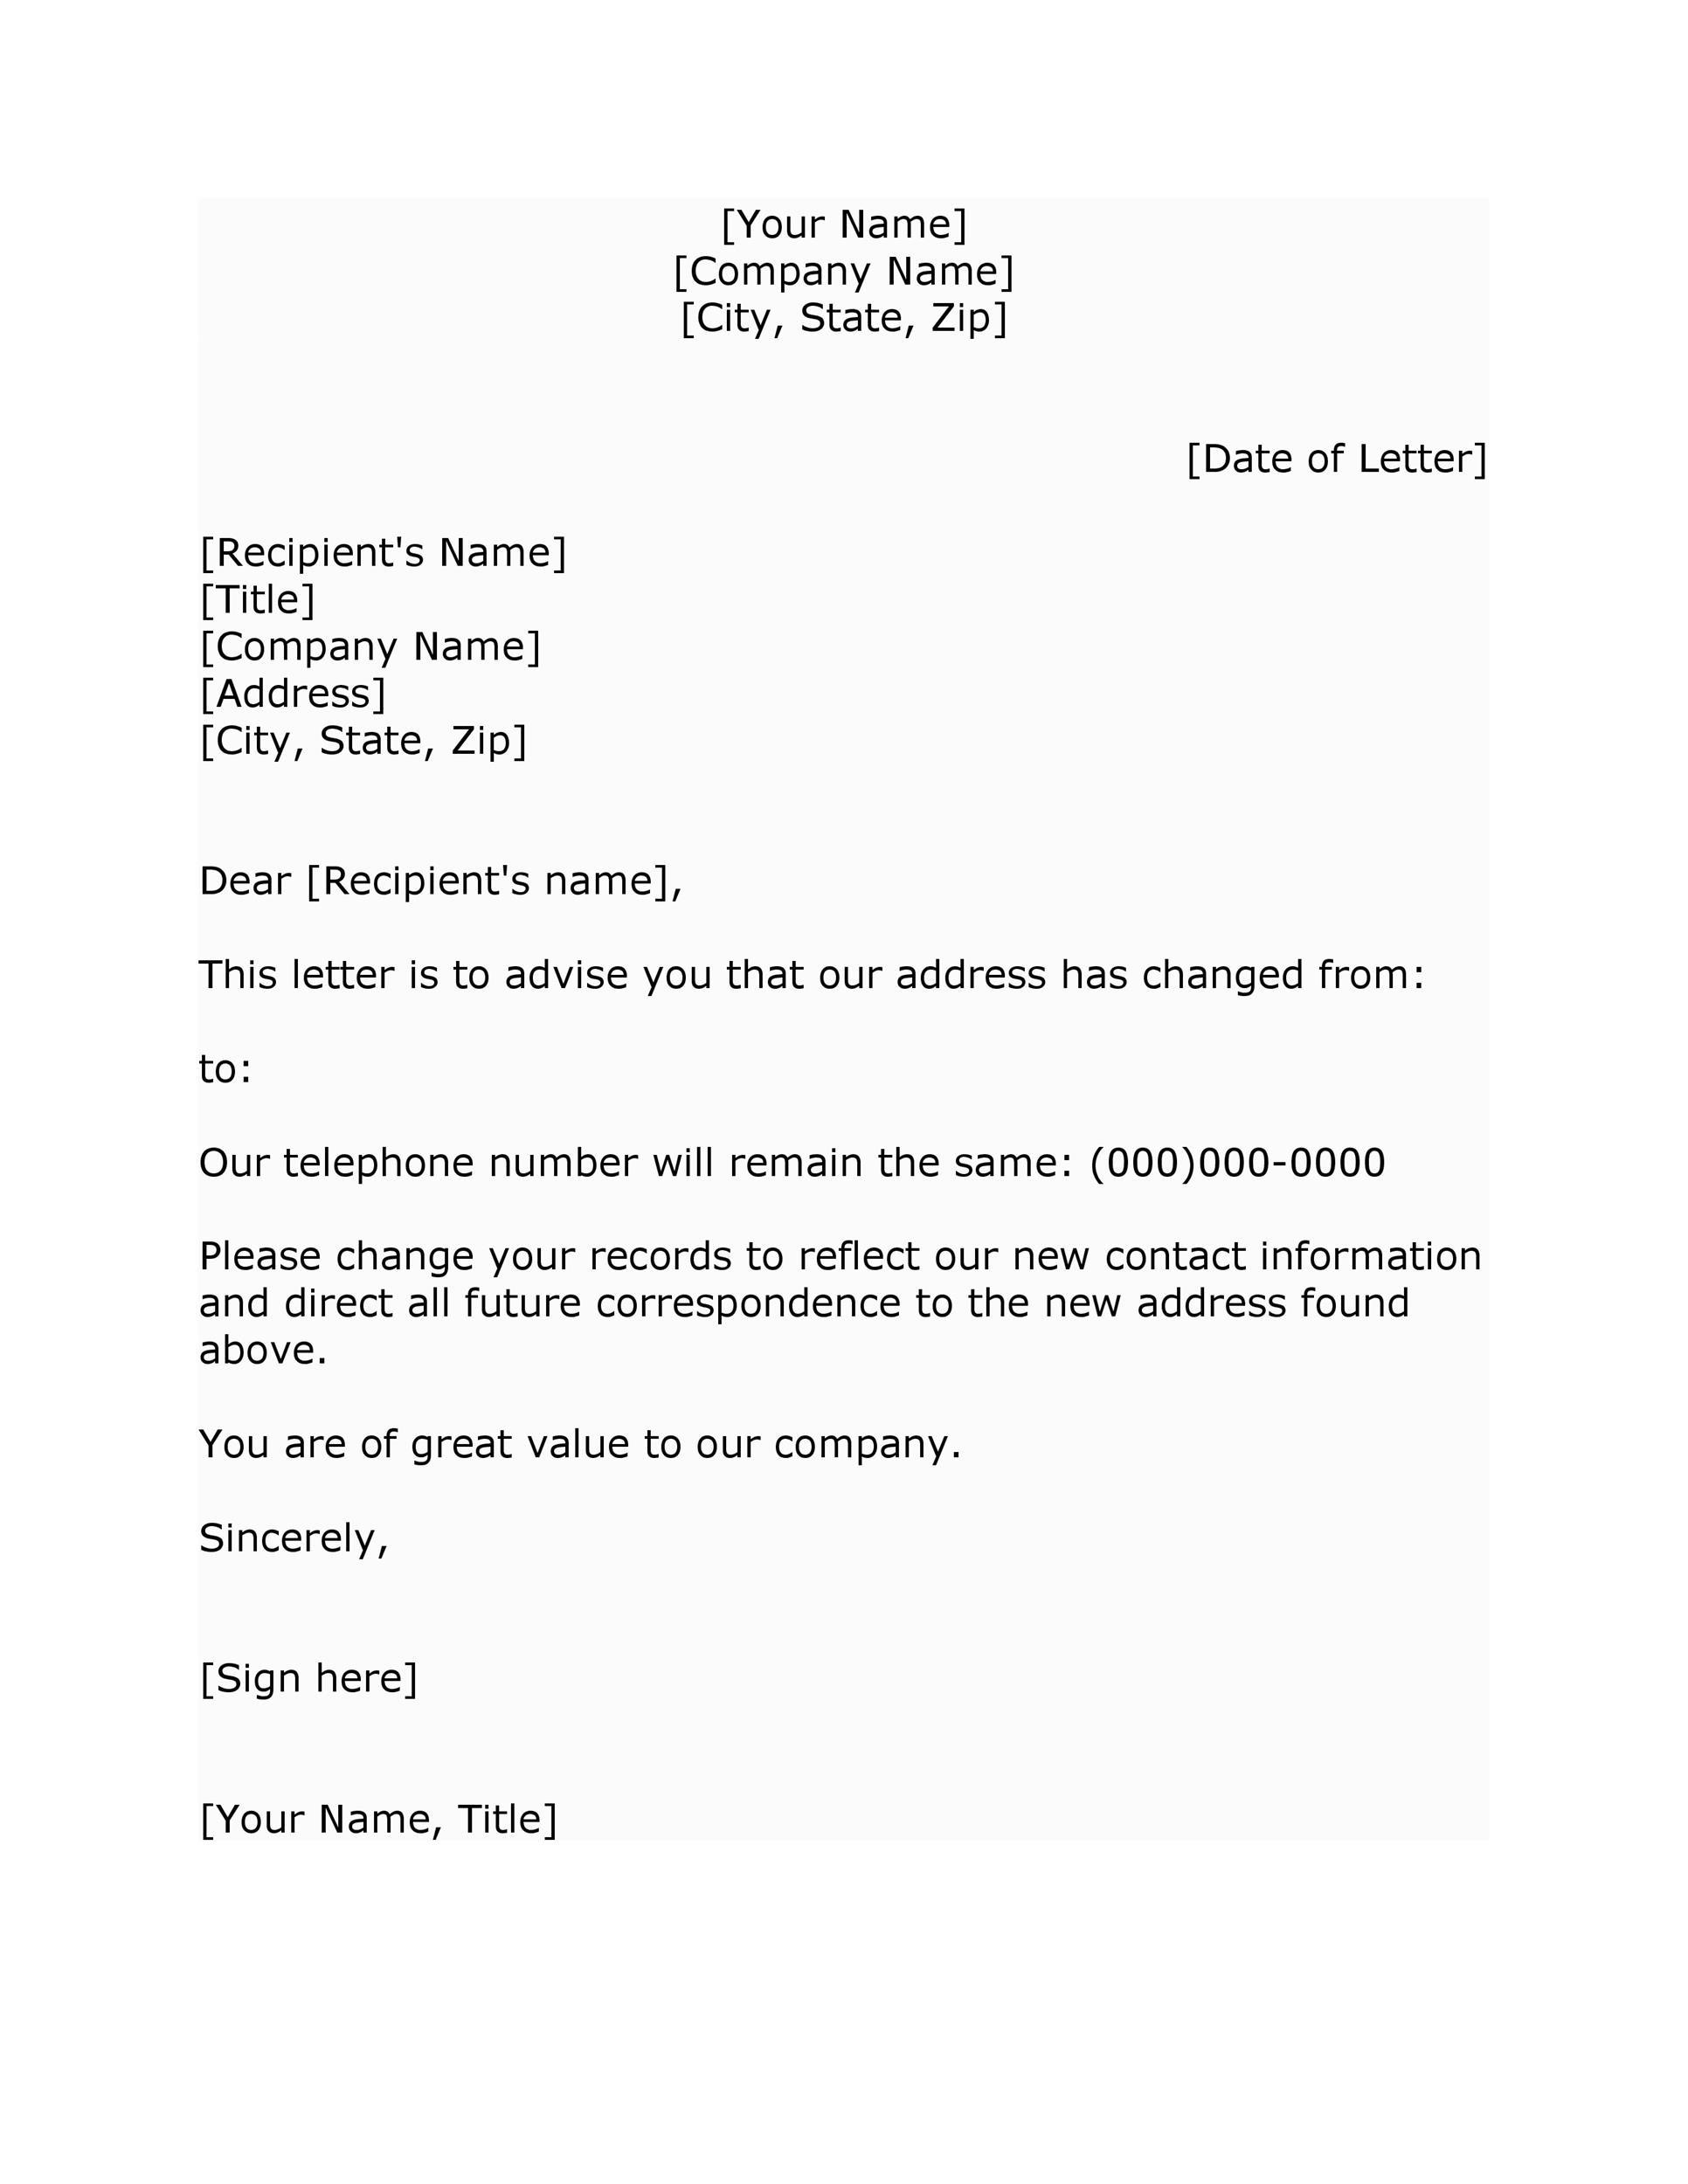 Free change of address letter 14